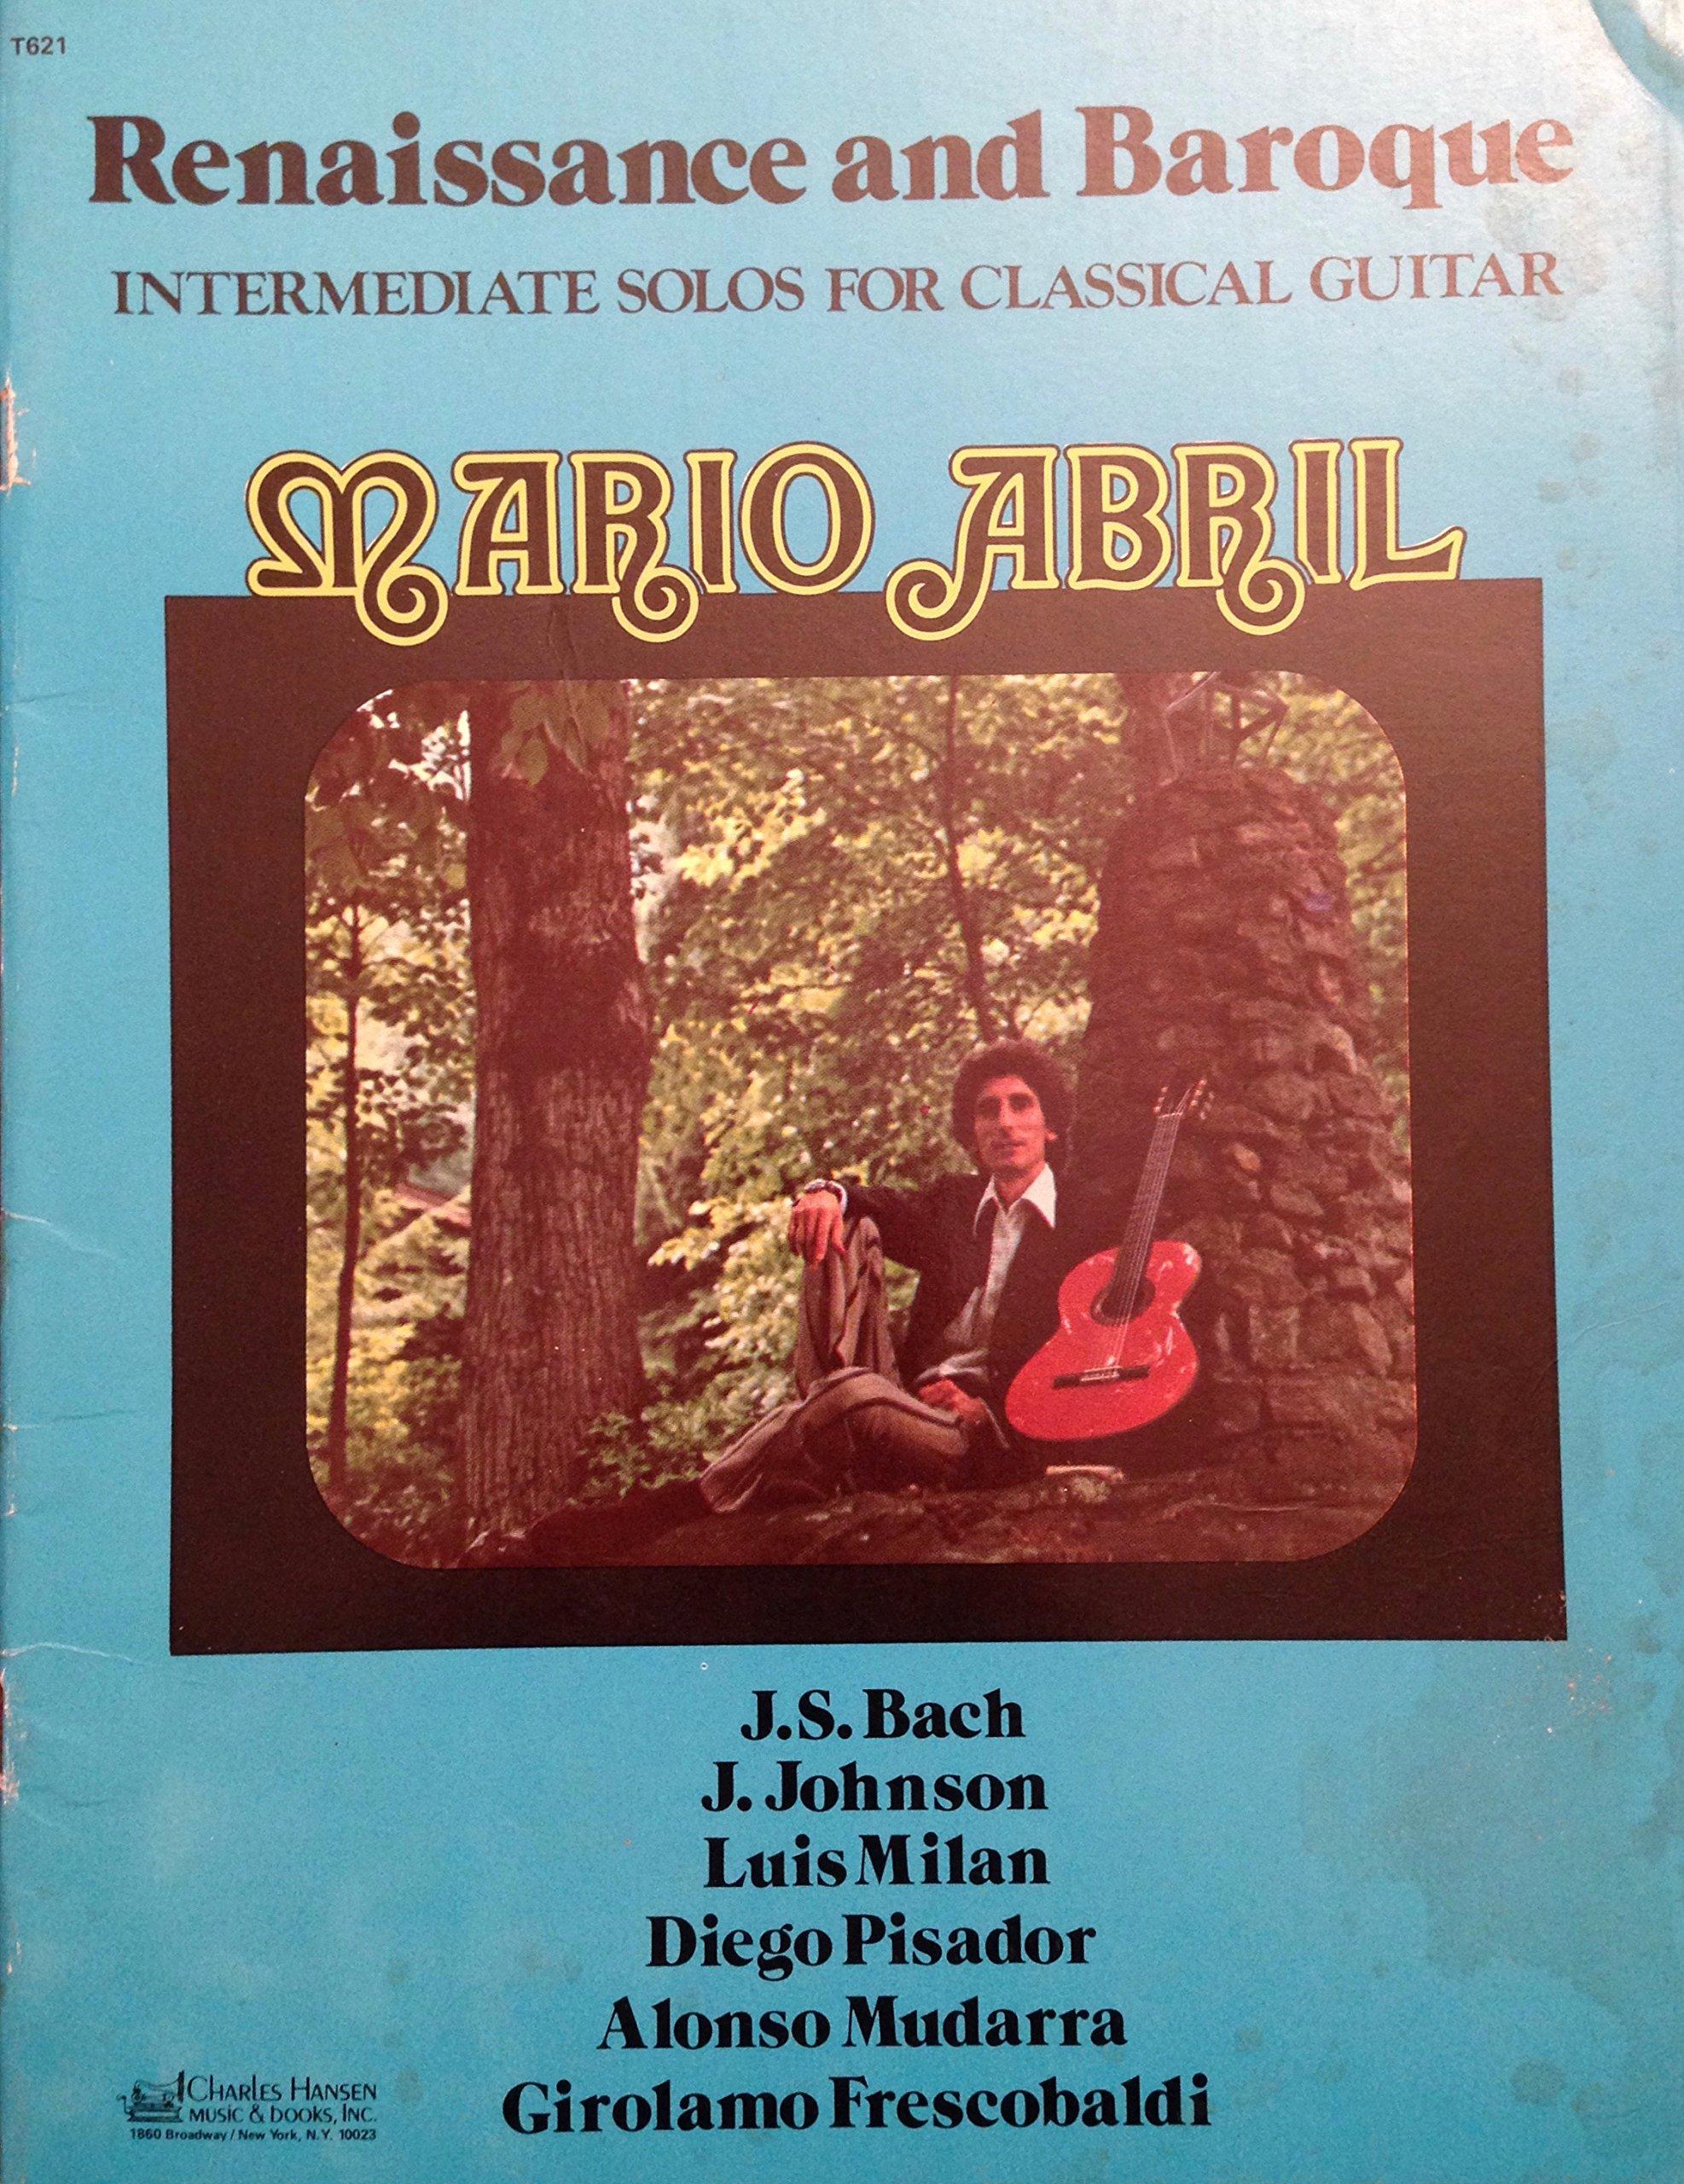 Renaissance and Baroque Intermediate Solos for Classical Guitar, Mario Abril, et al.